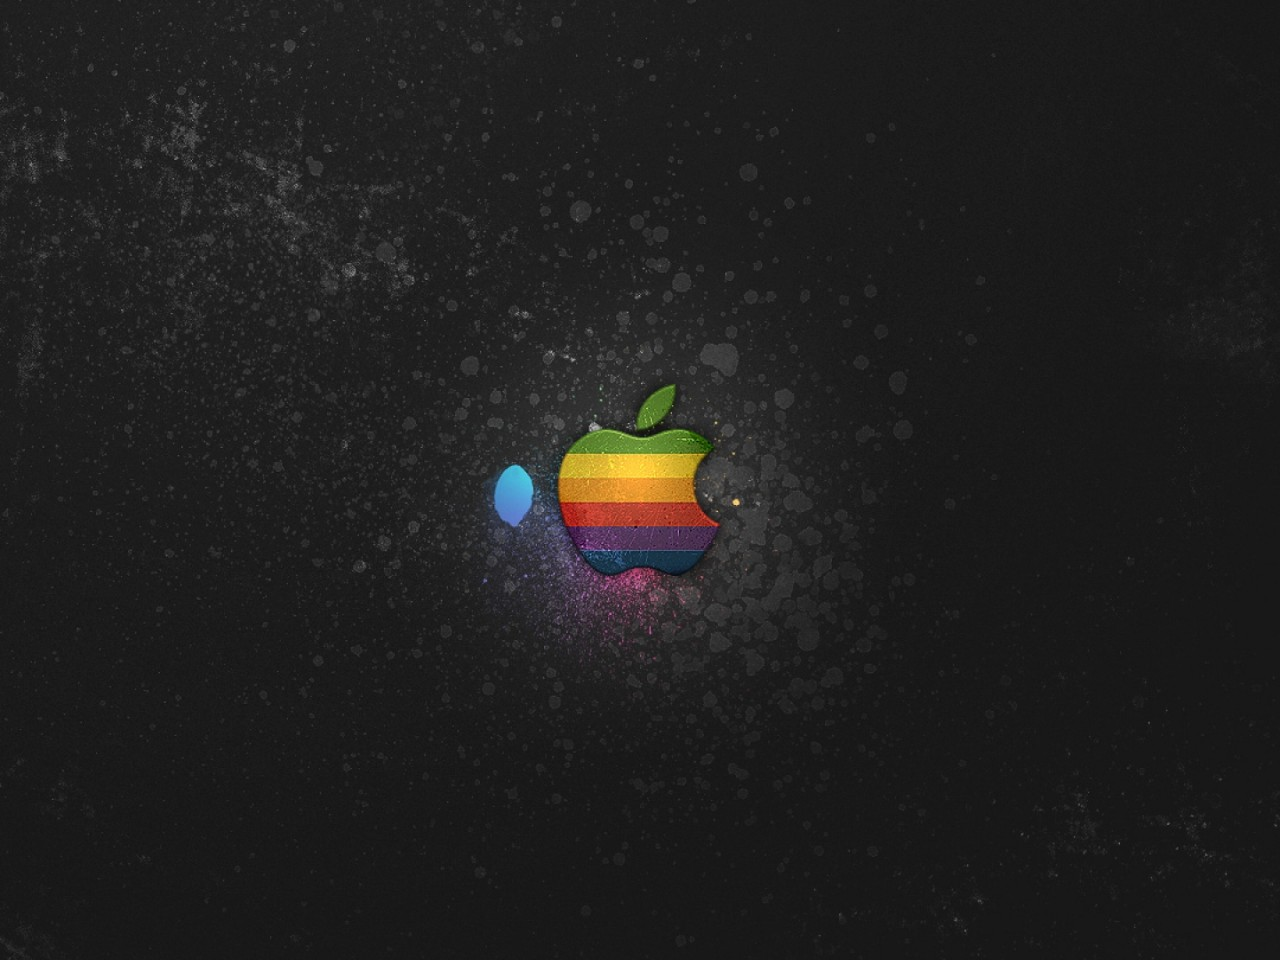 500 Wallpaper Apple Os X HD